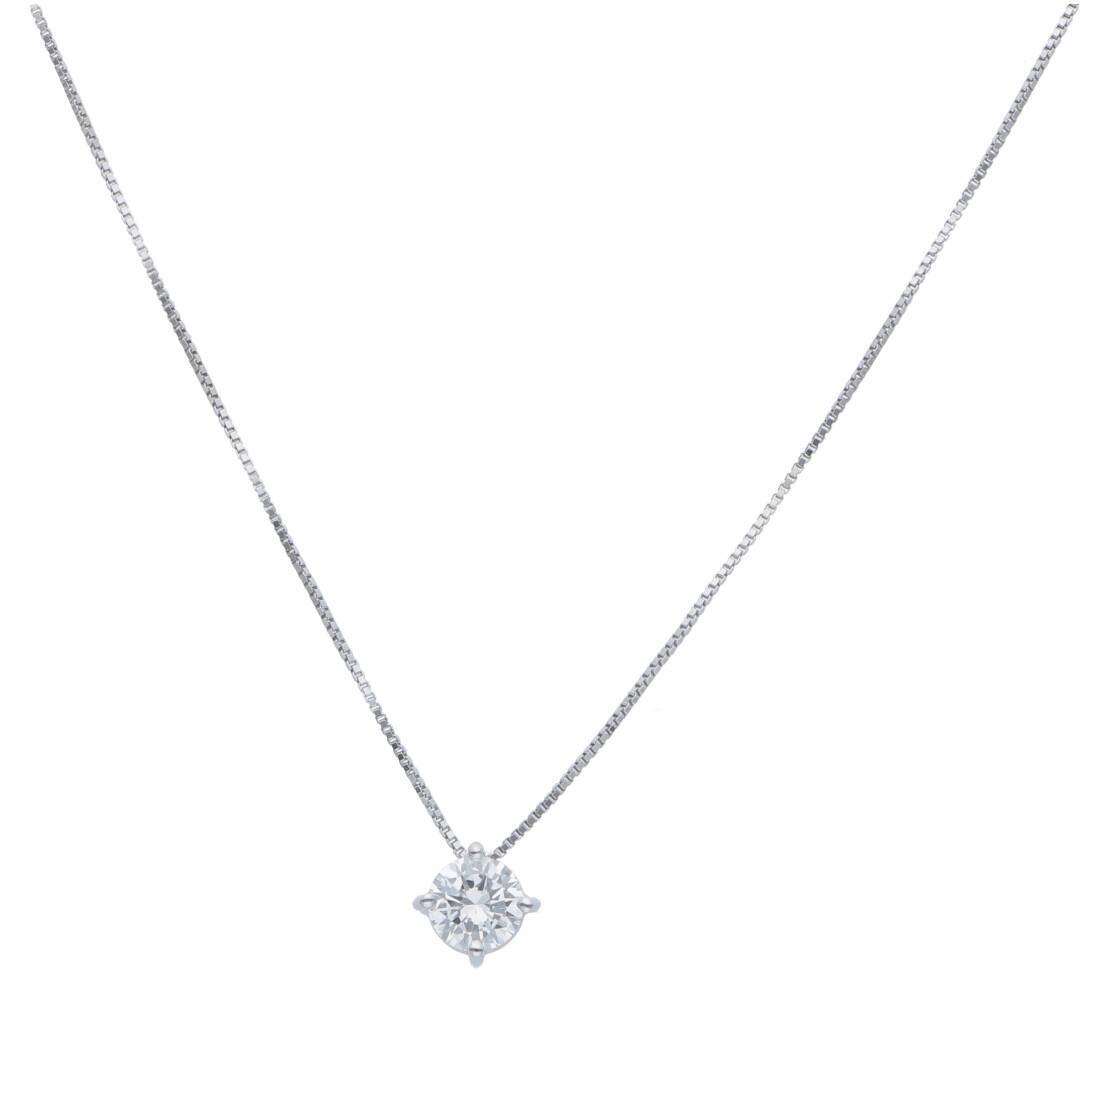 Collana punto luce con diamanti ct 0,32 - ALFIERI & ST. JOHN